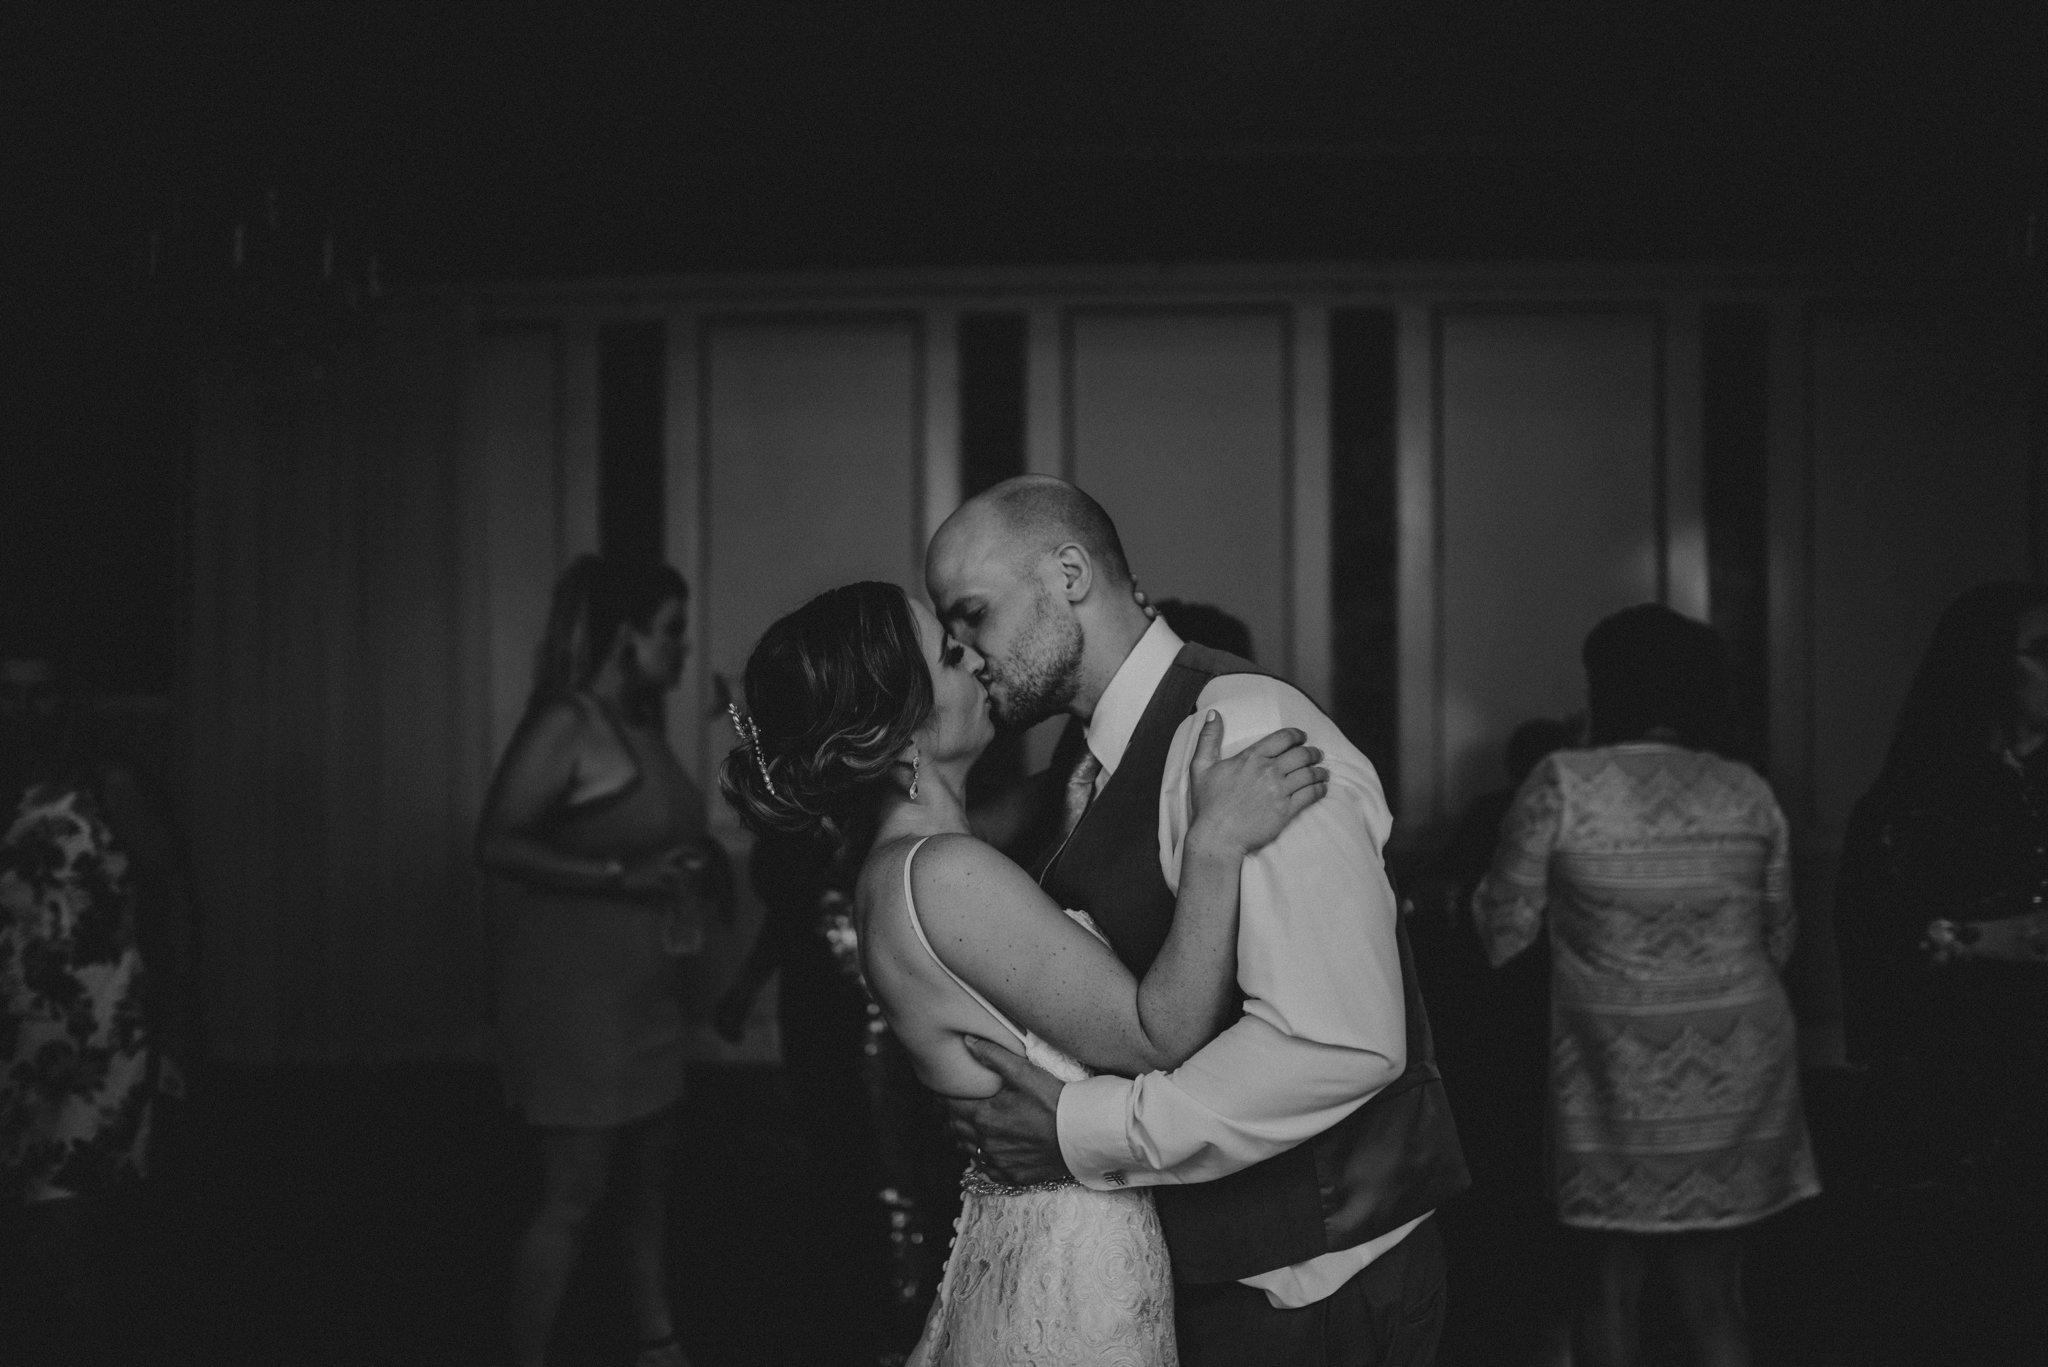 hollywood-school-house-wedding-seattle-photographer-caitlyn-nikula-129.jpg